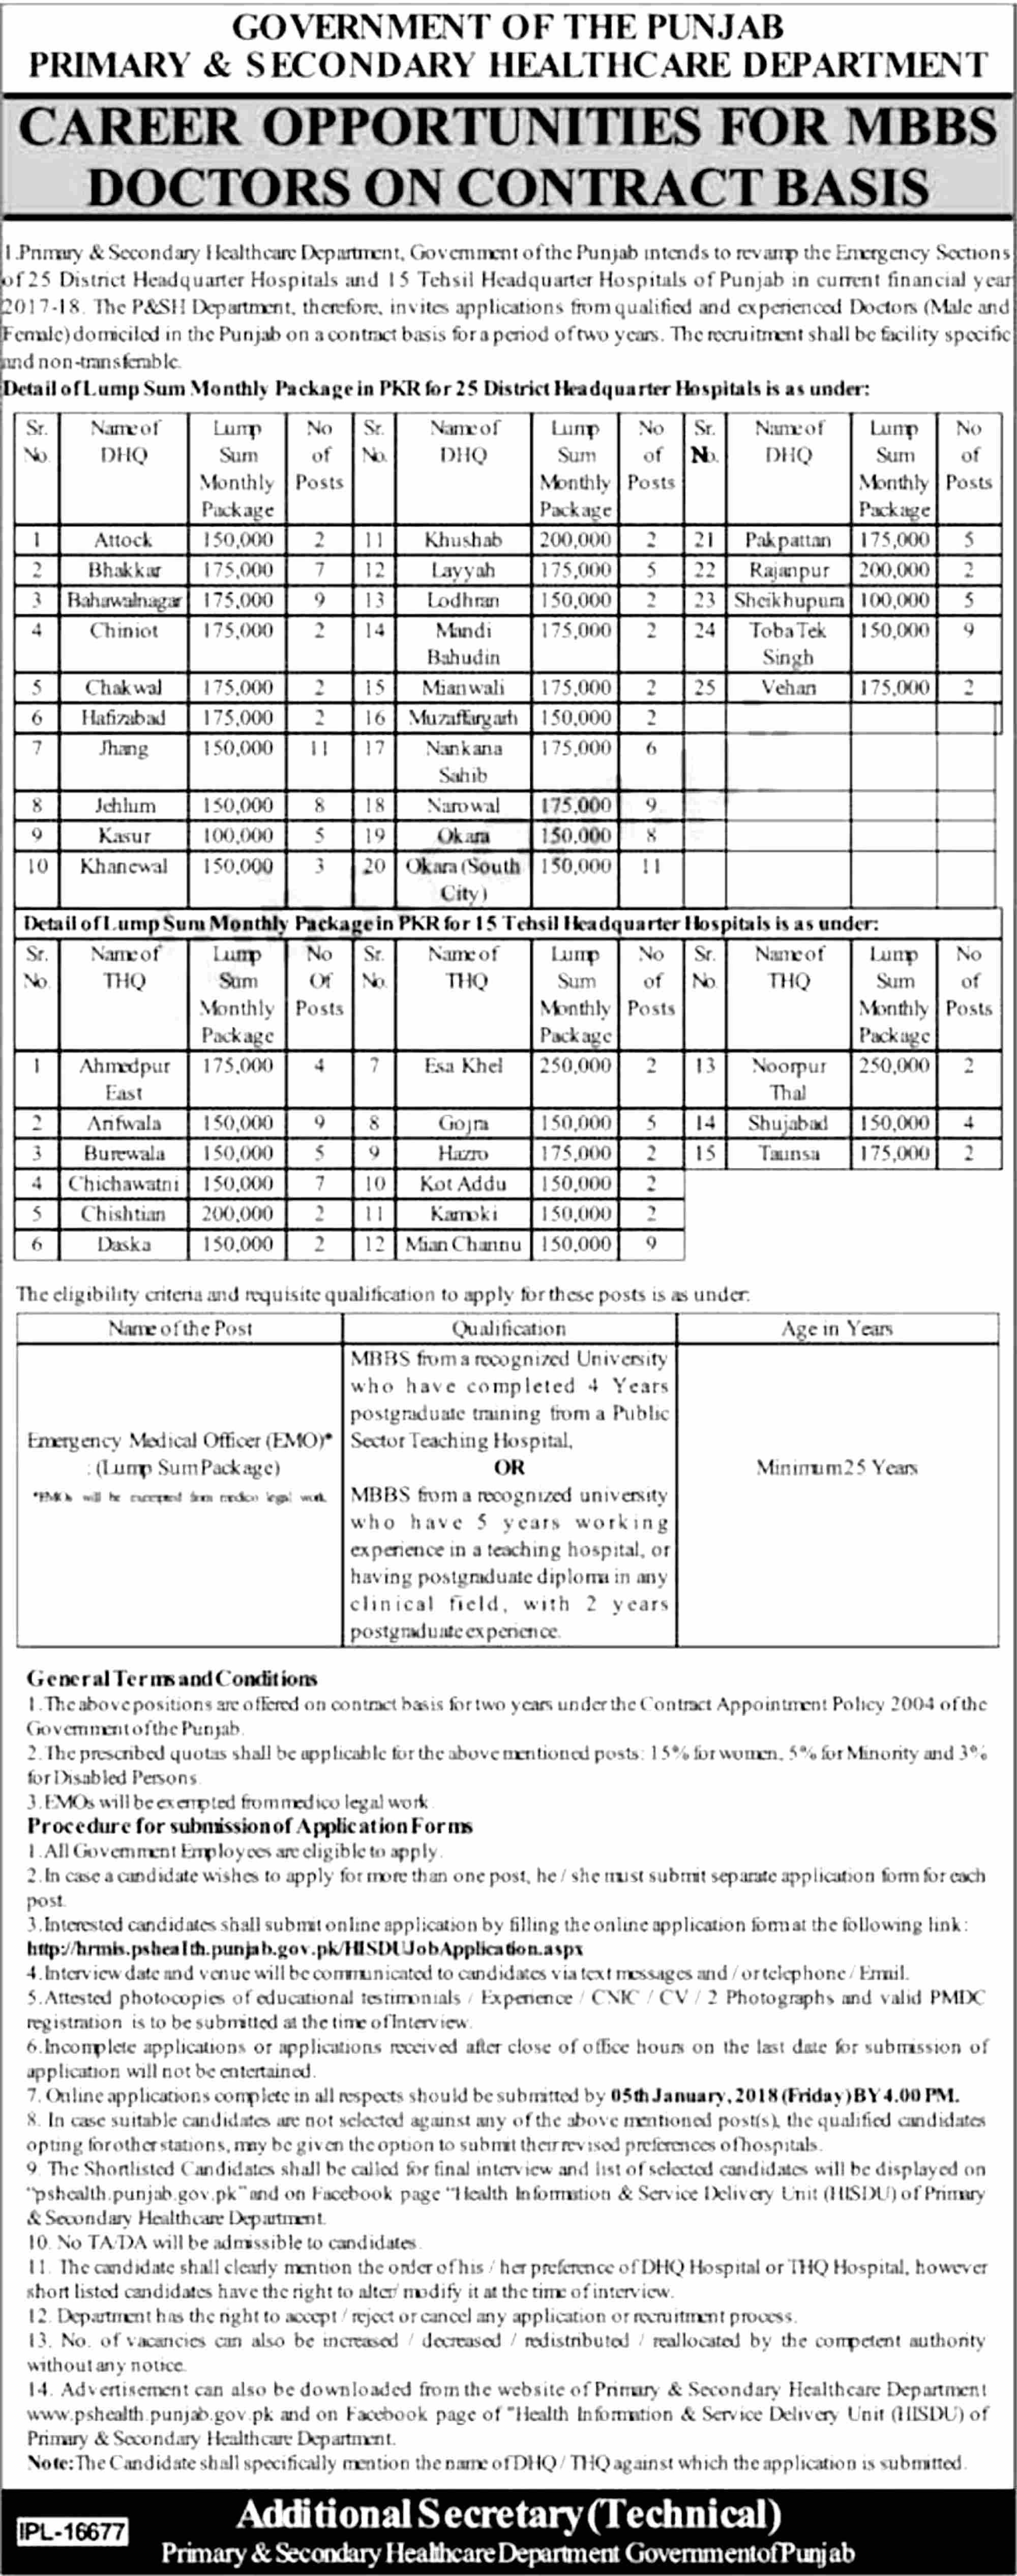 Punjab Primary & Secondary Healthcare 182 Medical Jobs Dunya Newspaper 16/12/2017